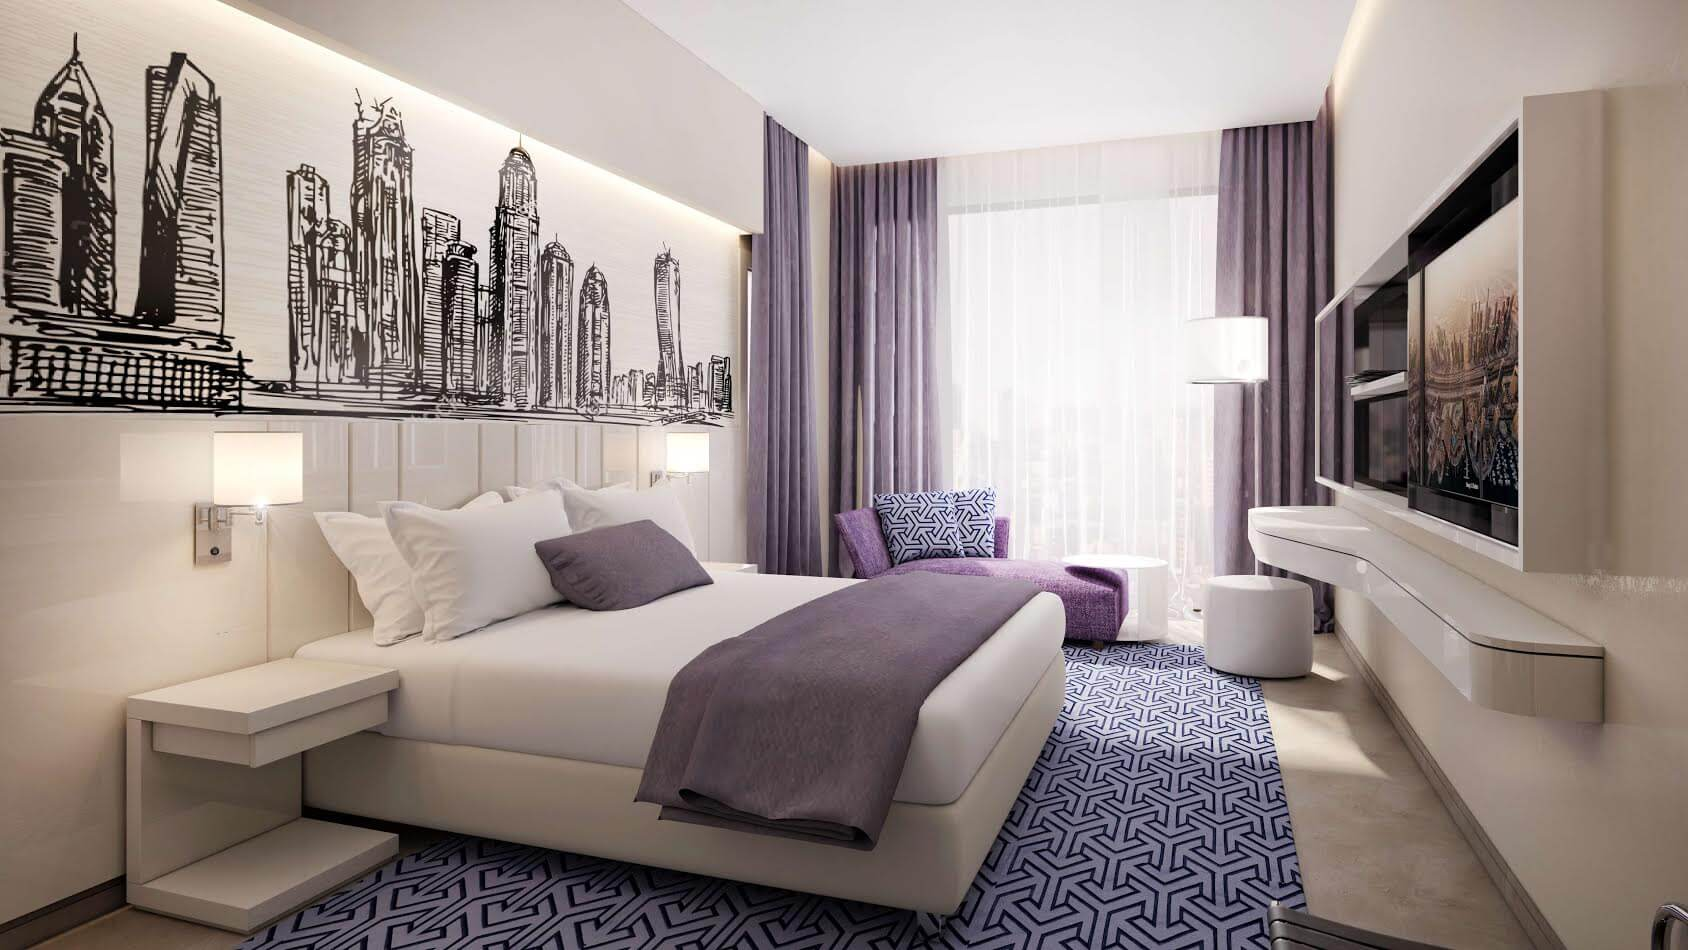 Photo of أكور للفنادق تستعد لإفتتاح فندقها الجديد ميركيور دبي برشا هايتس